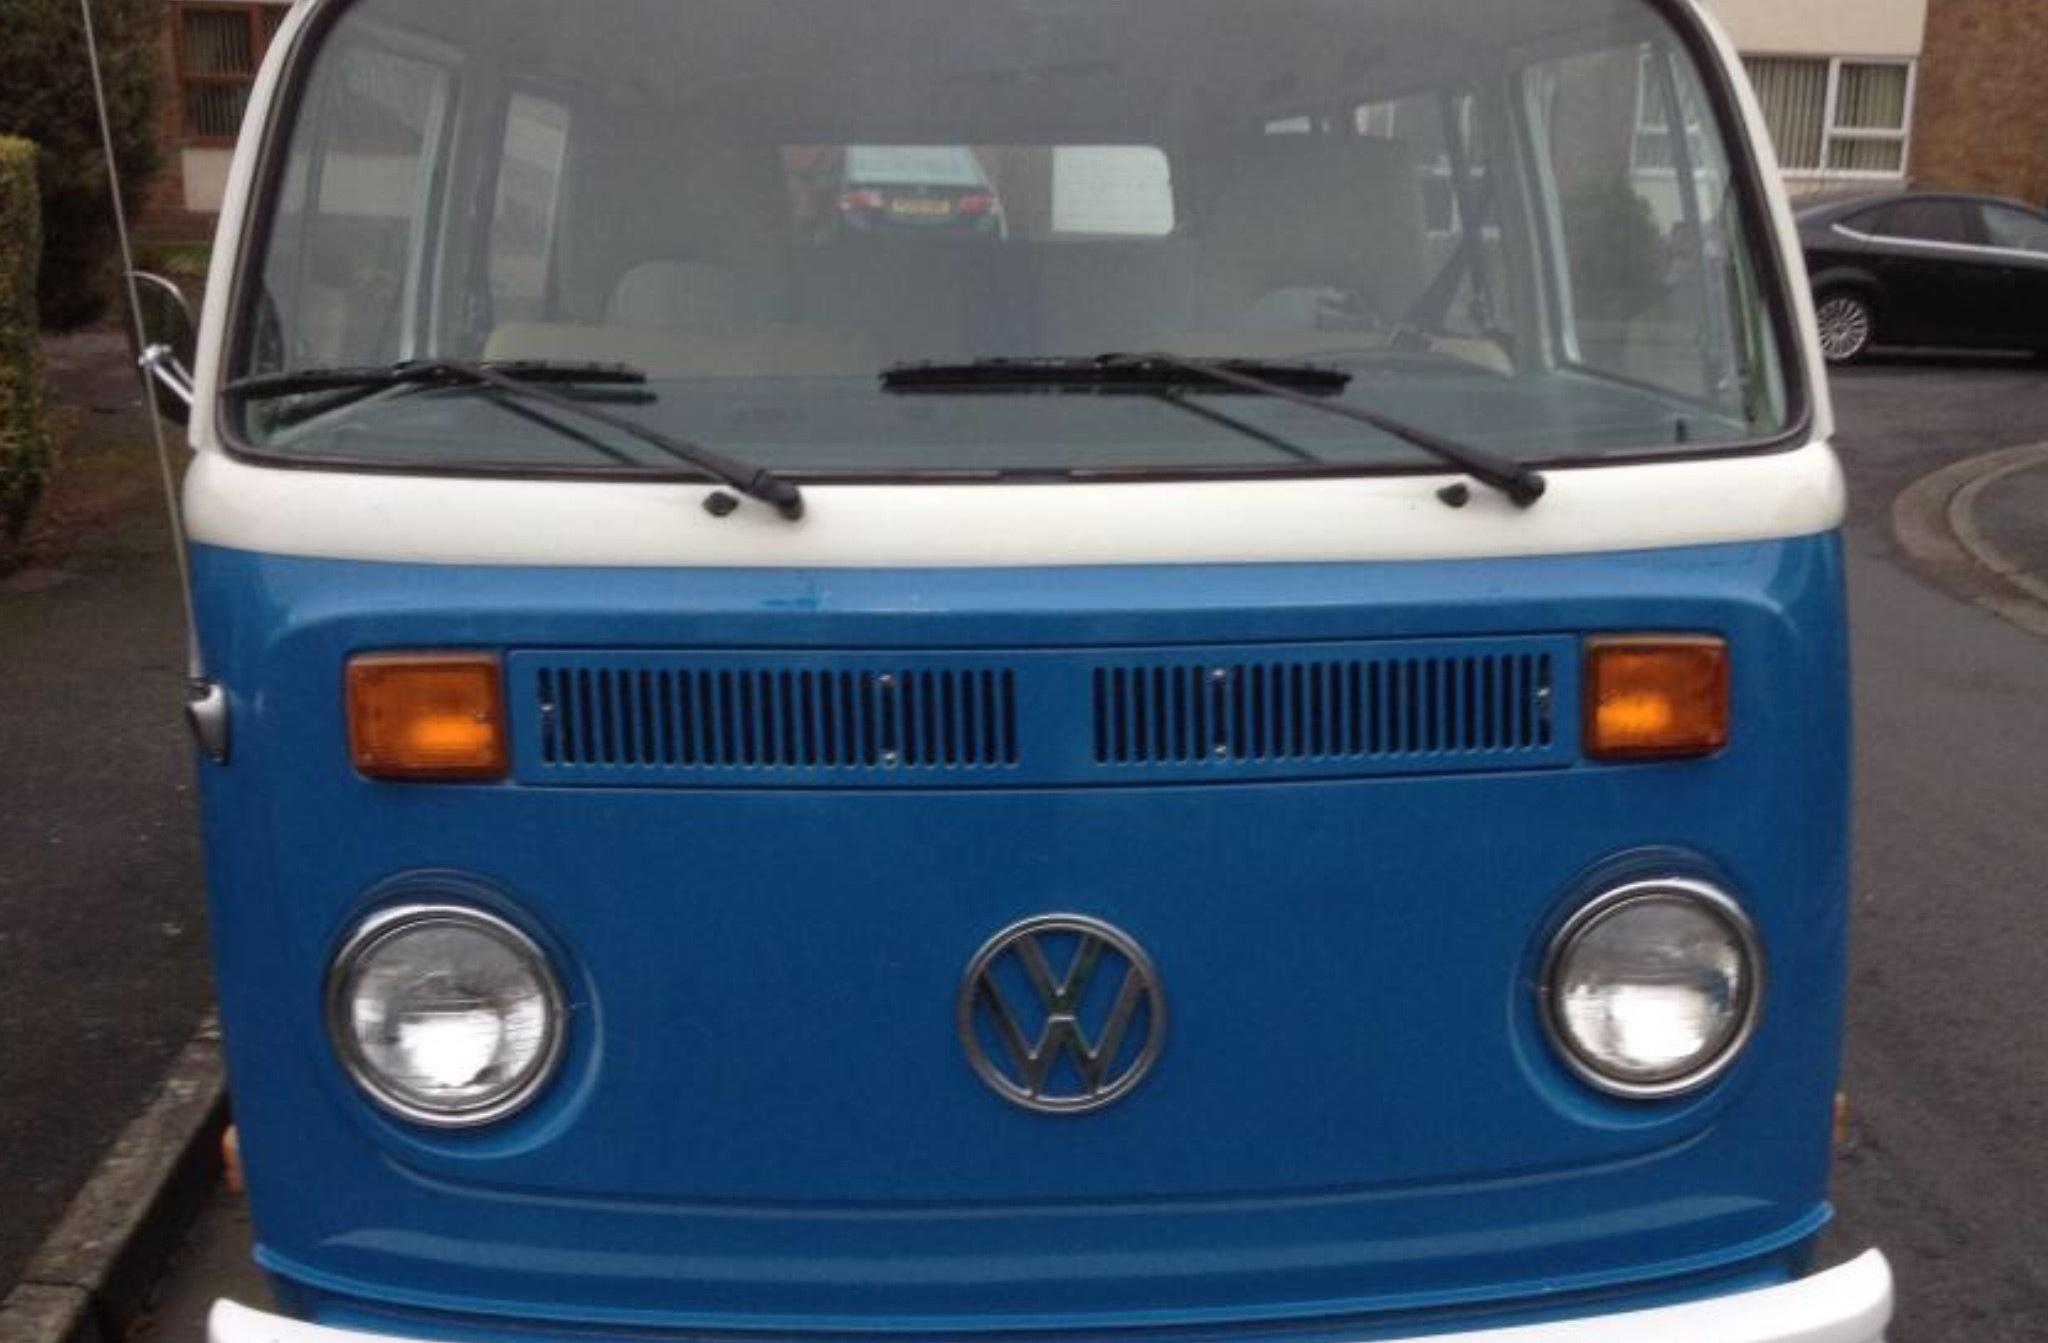 Bluebelle prior to restoration